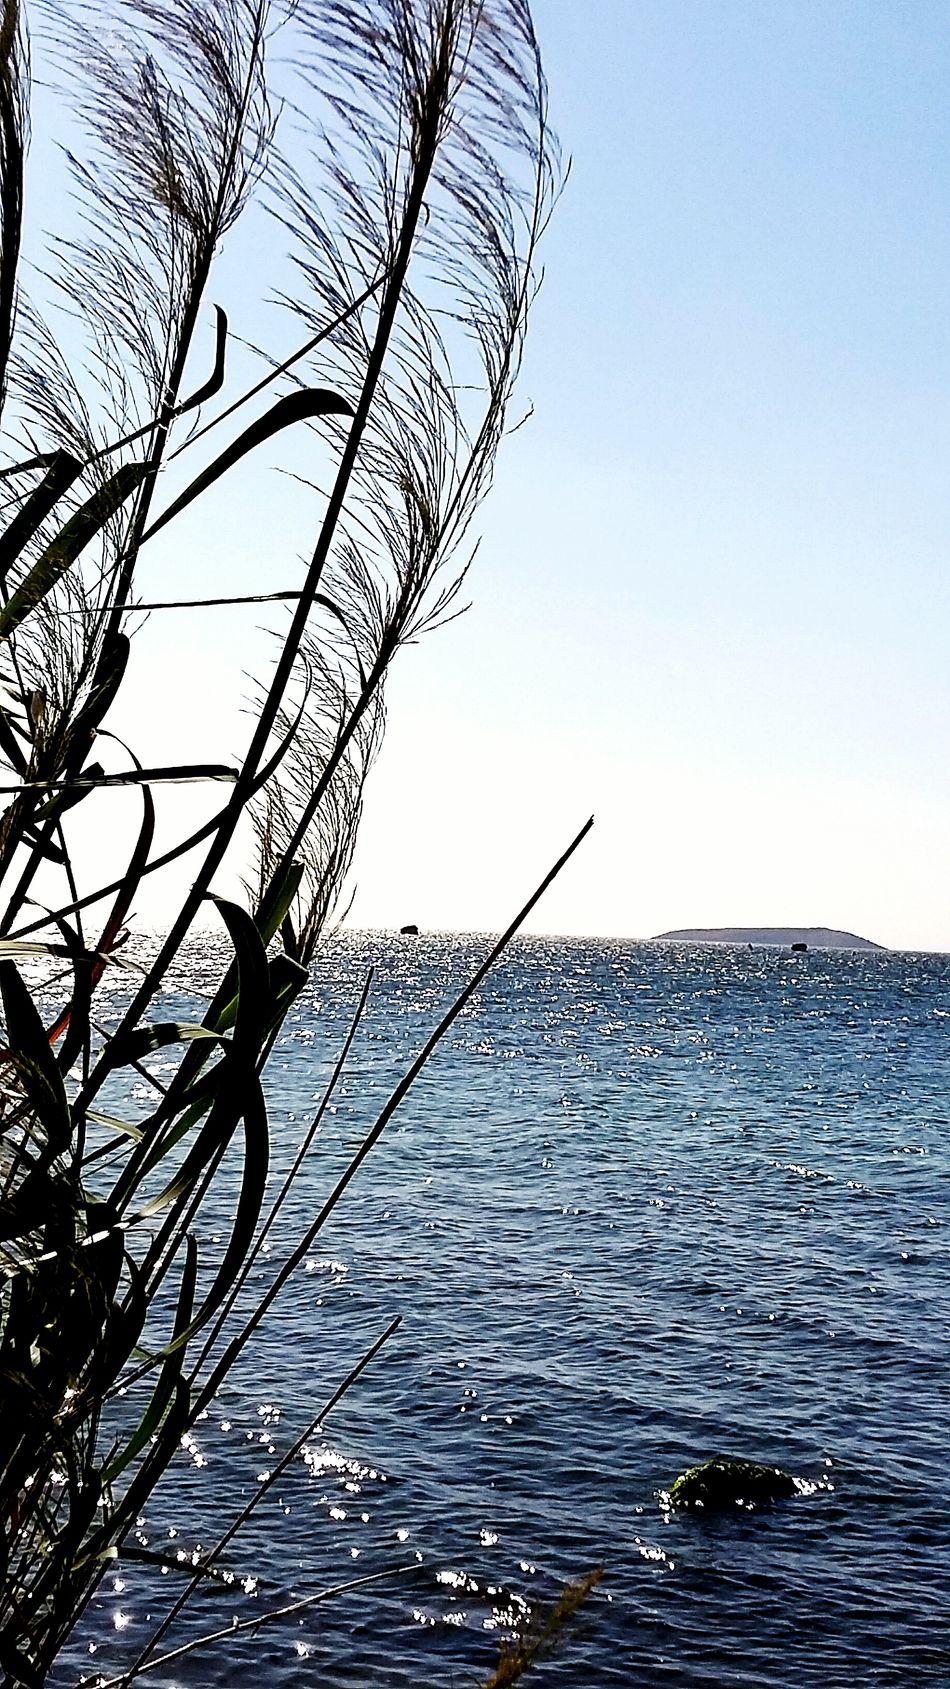 First Eyeem Photo Mybestphoto2015 Turkey Balikesir Turkey My Best Photo 2015 Shades Of Blue Sea And Sky Seaside Sea Sea_collection Showcase: December